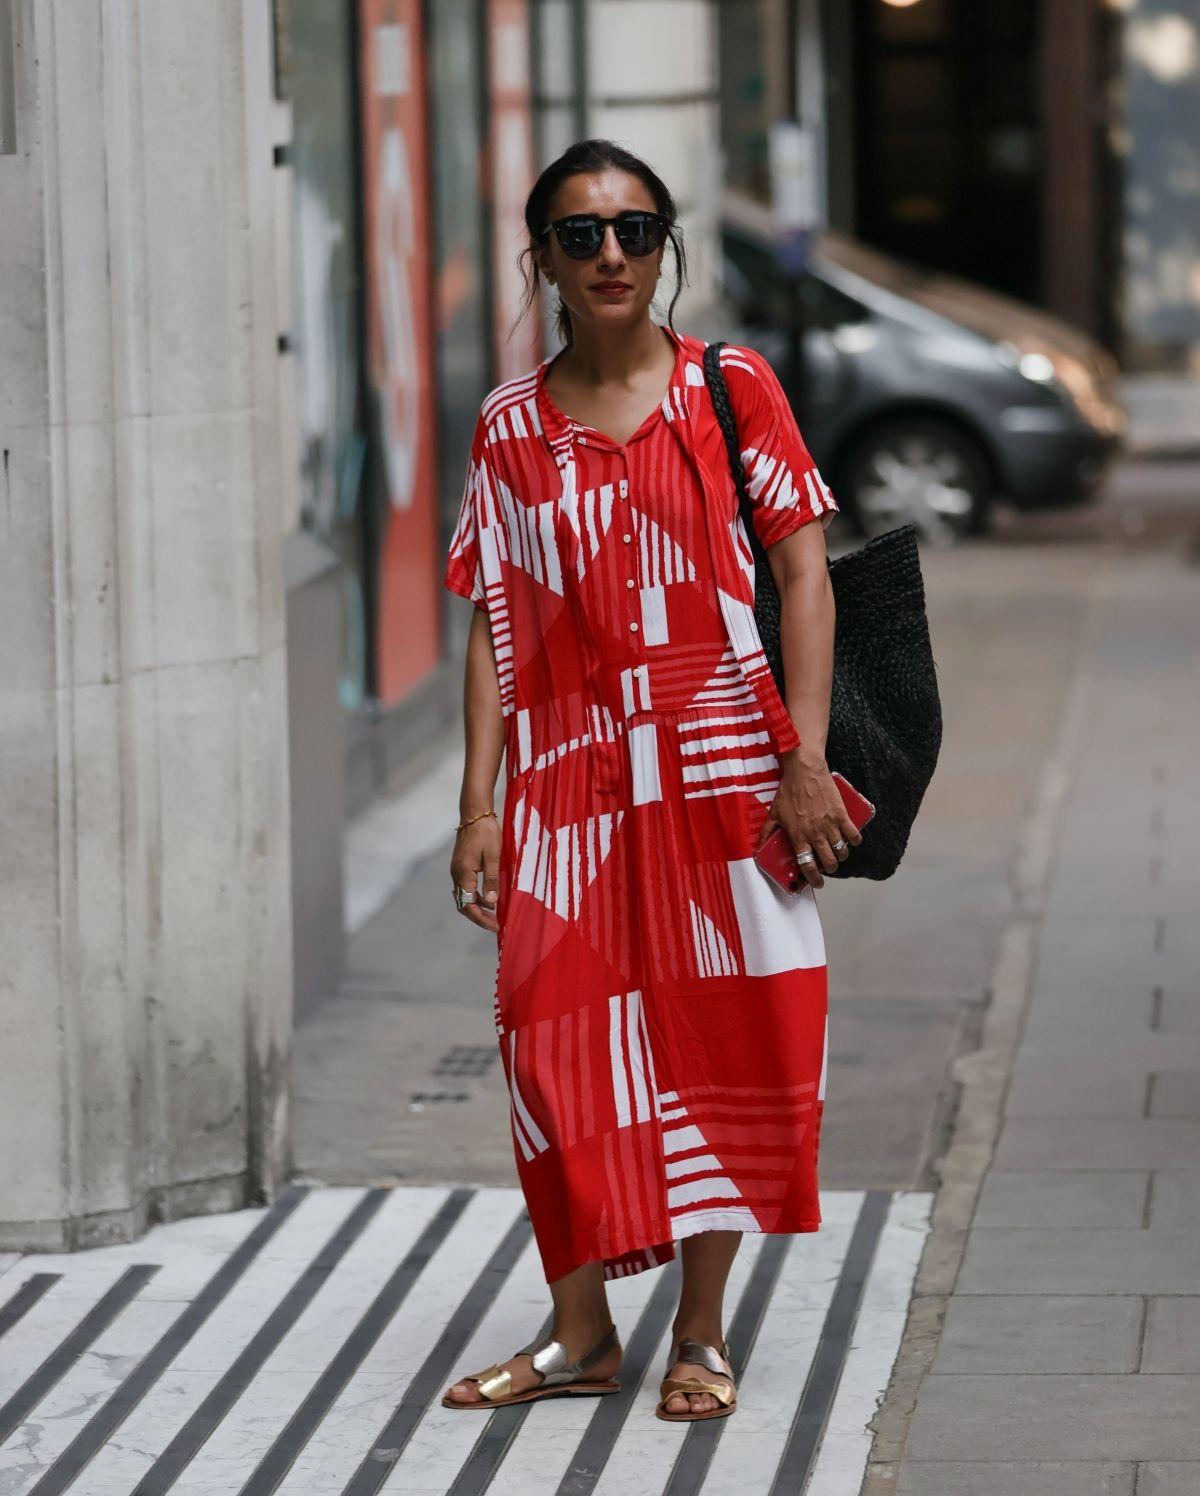 Anita Rani Out About London